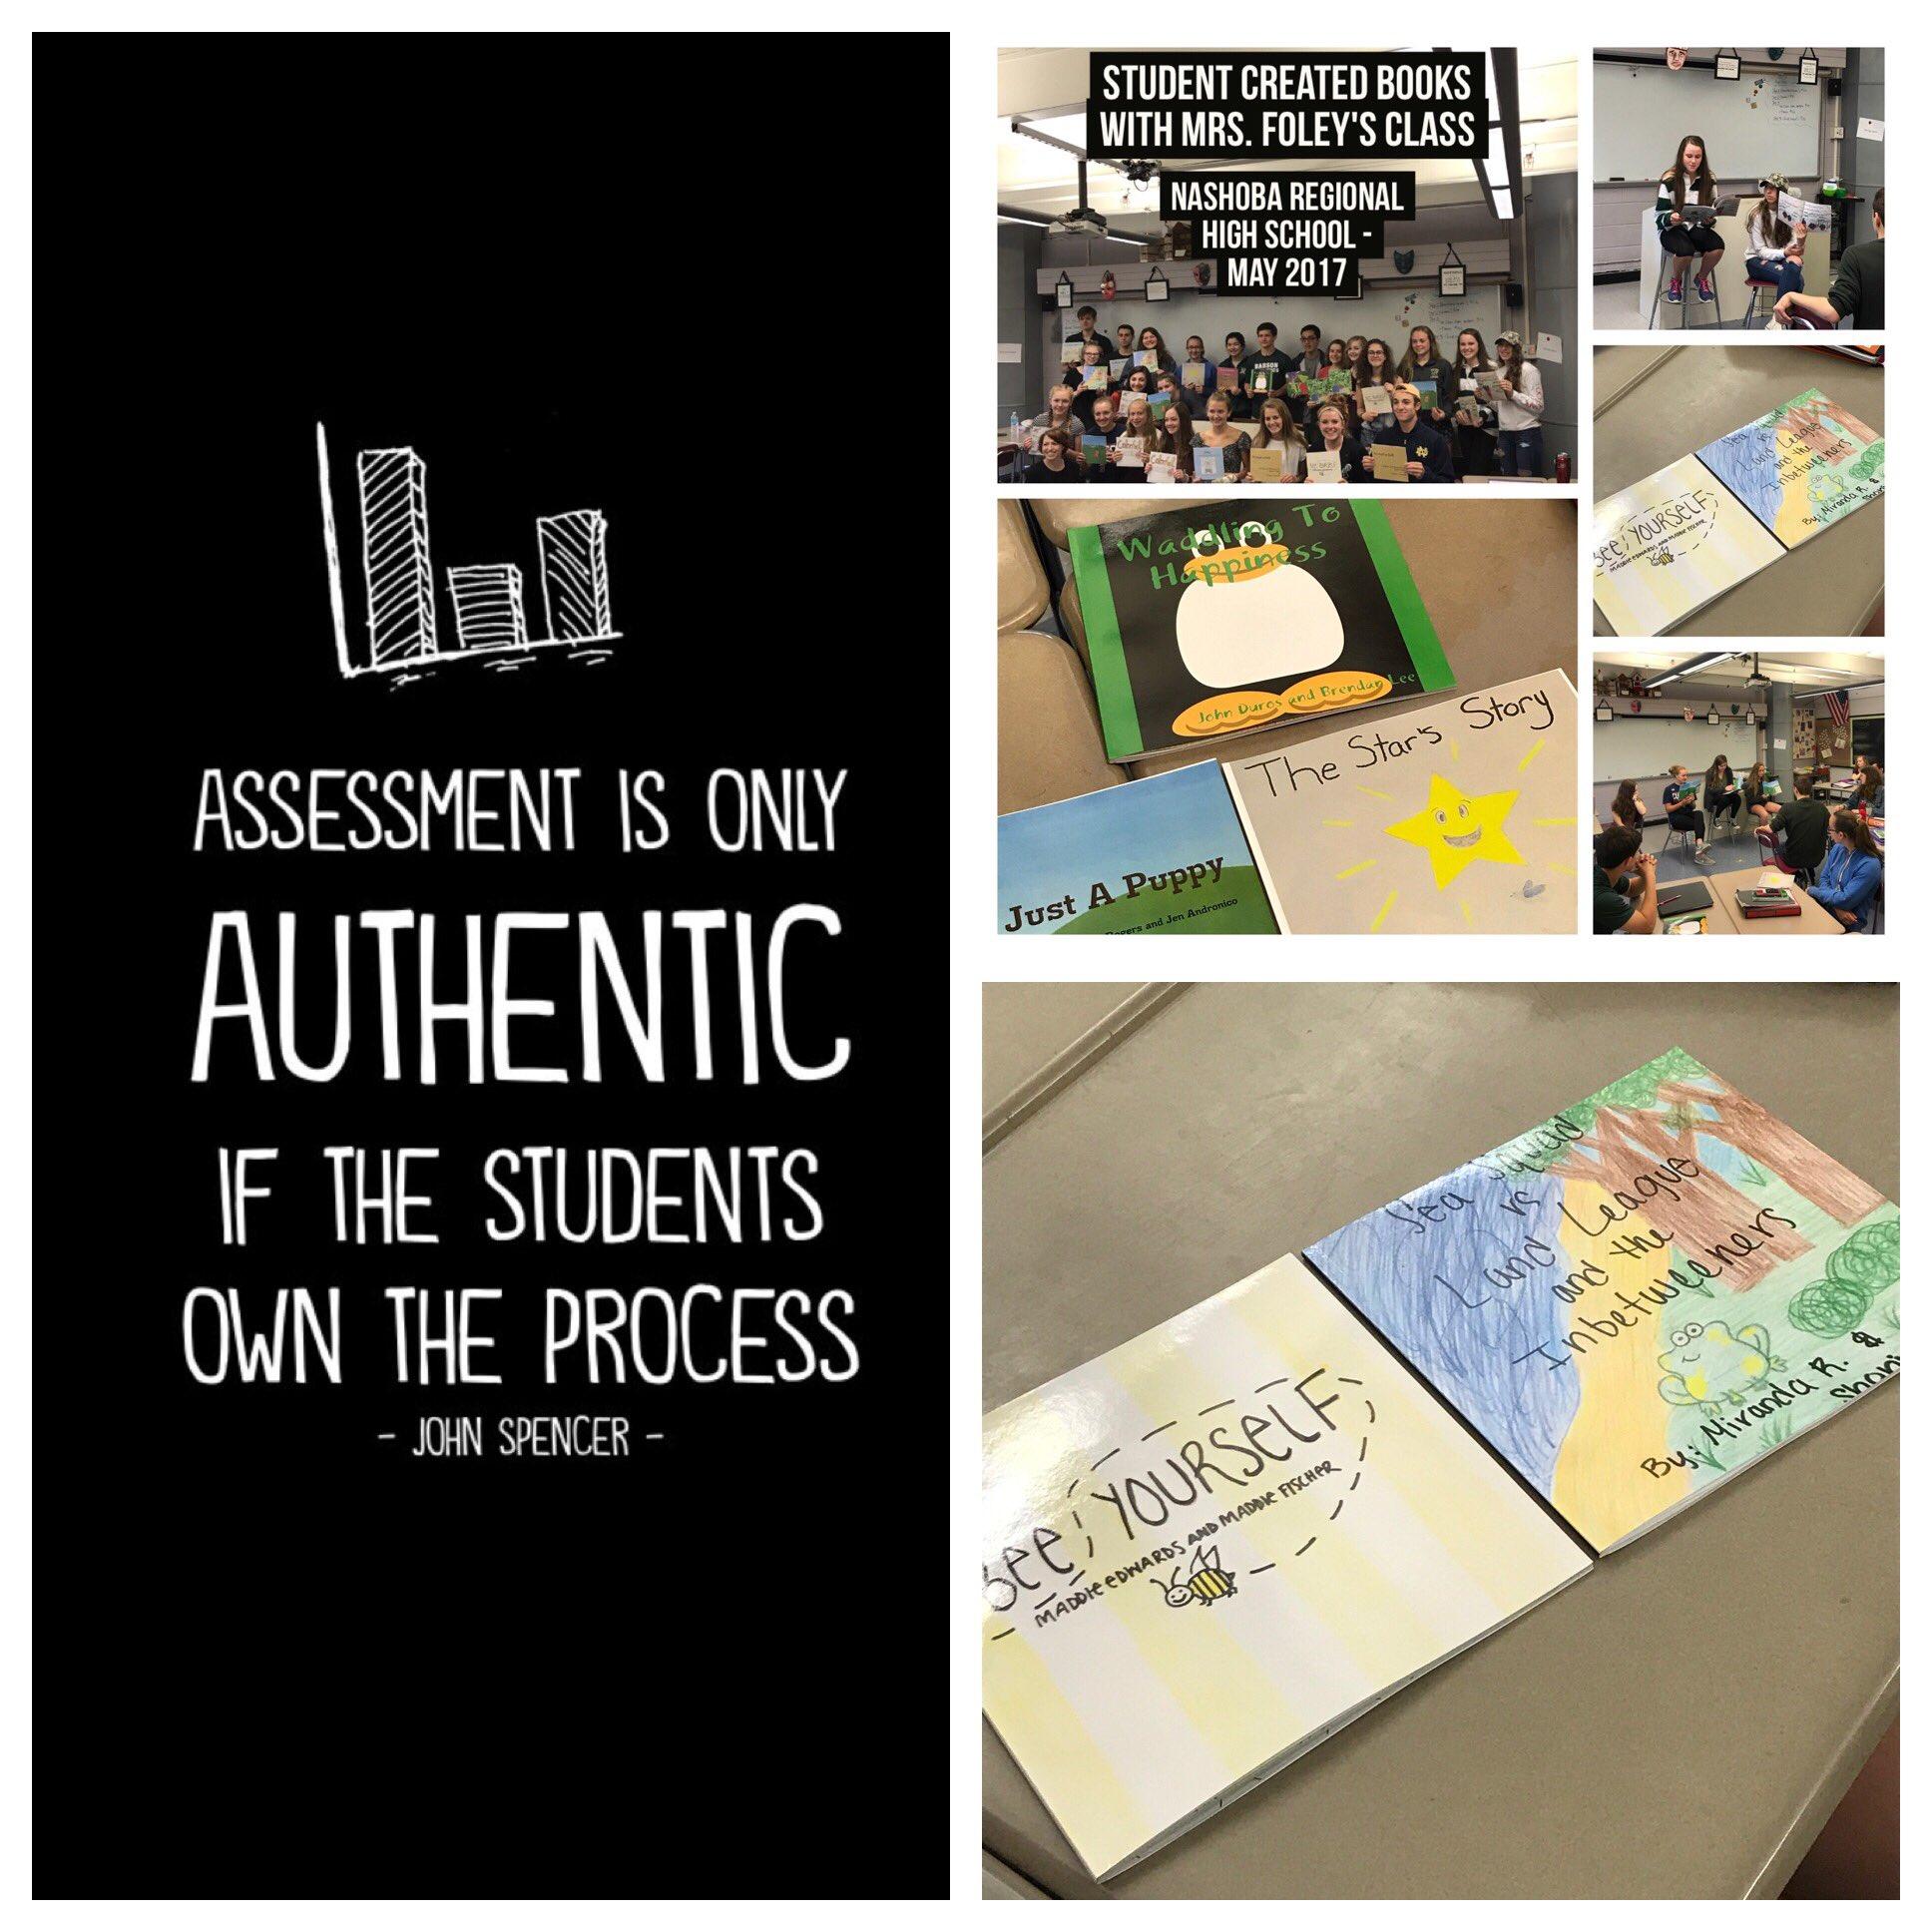 Student published work #PBL @BIEpbl #designthinking @spencerideas @FoleyProcko https://t.co/wnB67s1GvB